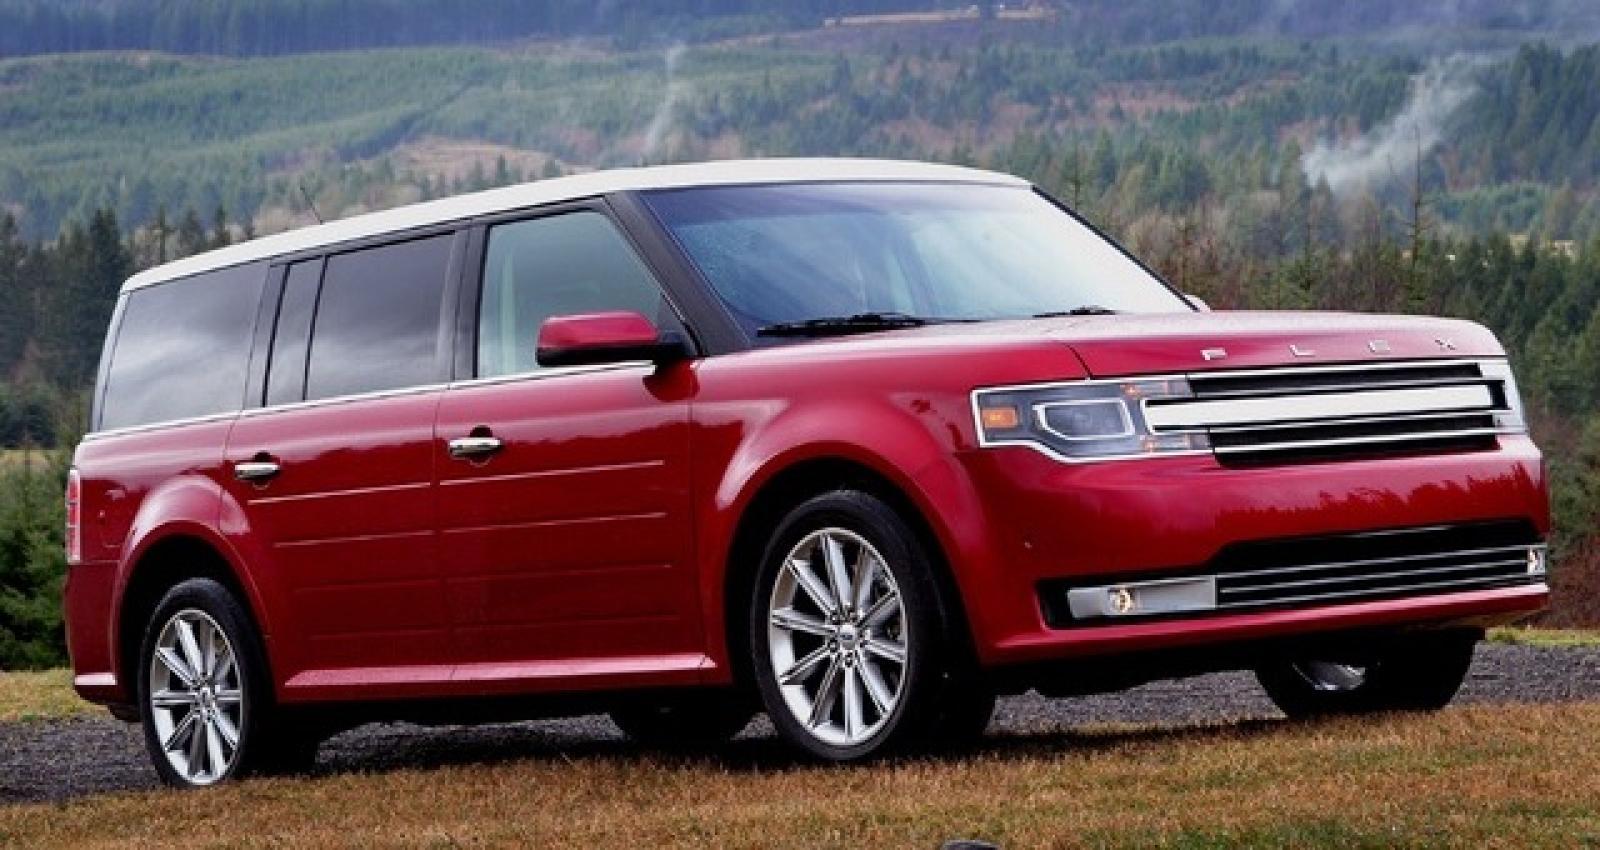 800 1024 1280 1600 origin 2015 ford flex